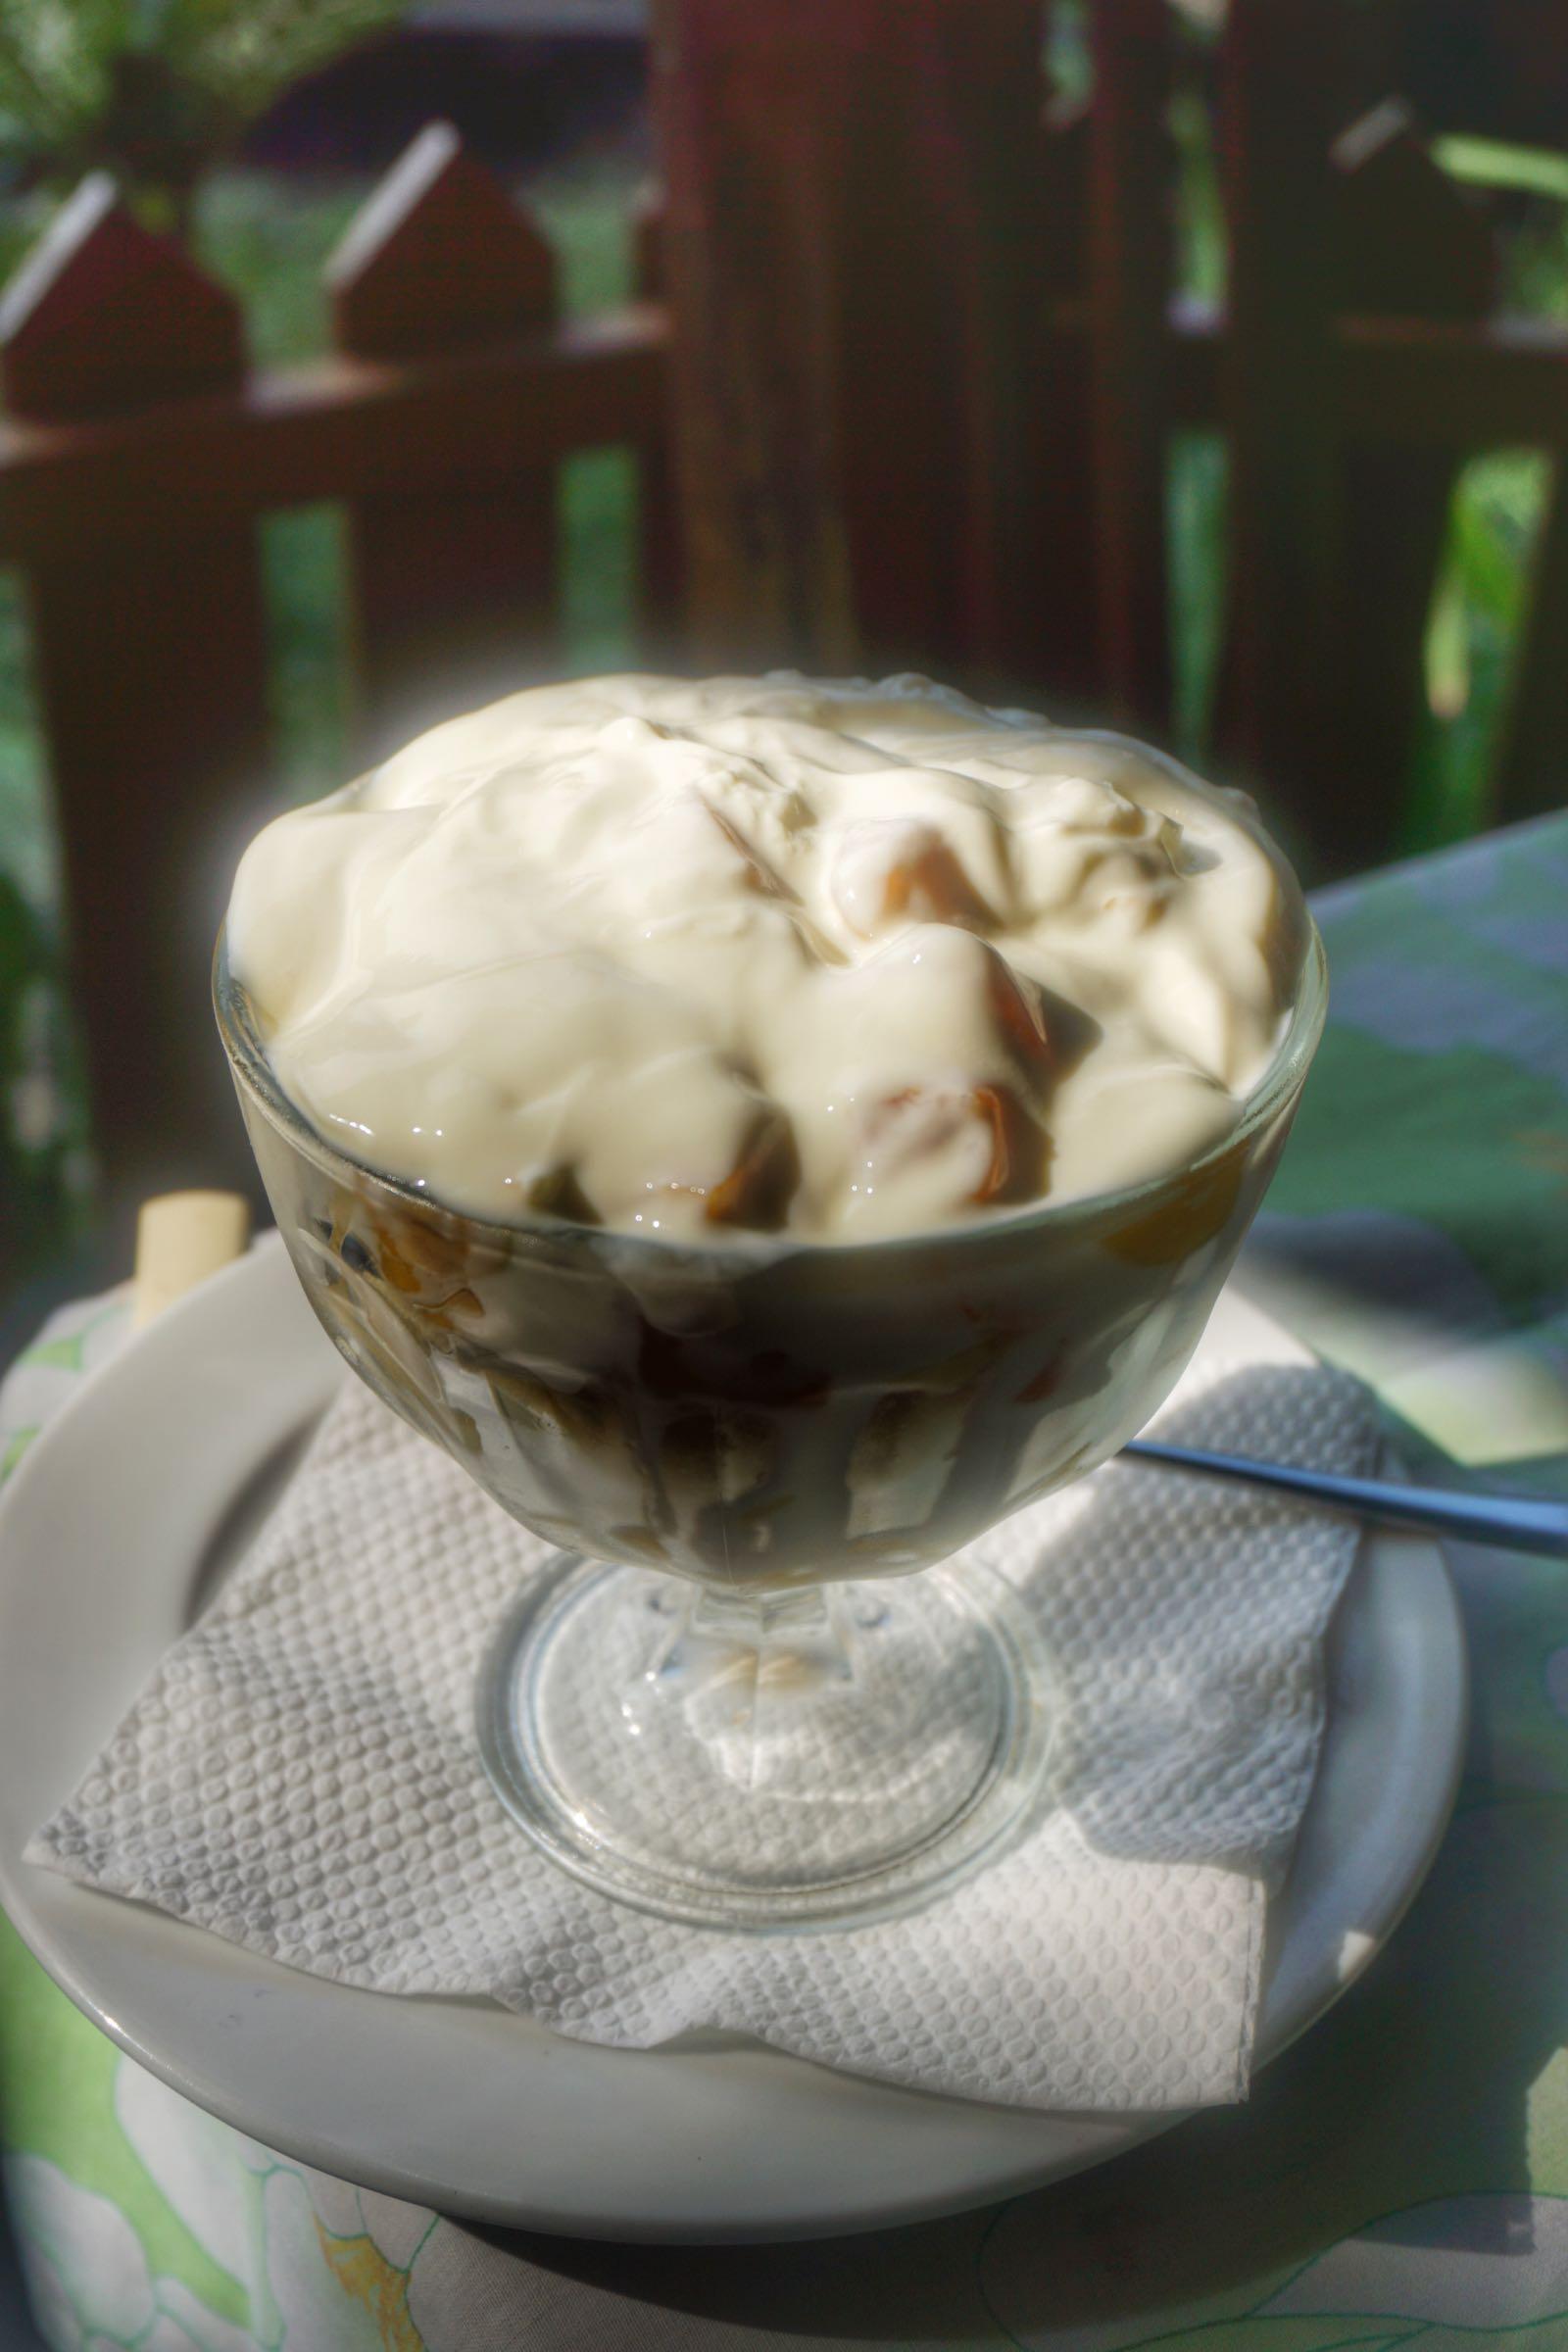 Restaurant Relax, Pangandaran fruit salad & yoghurt